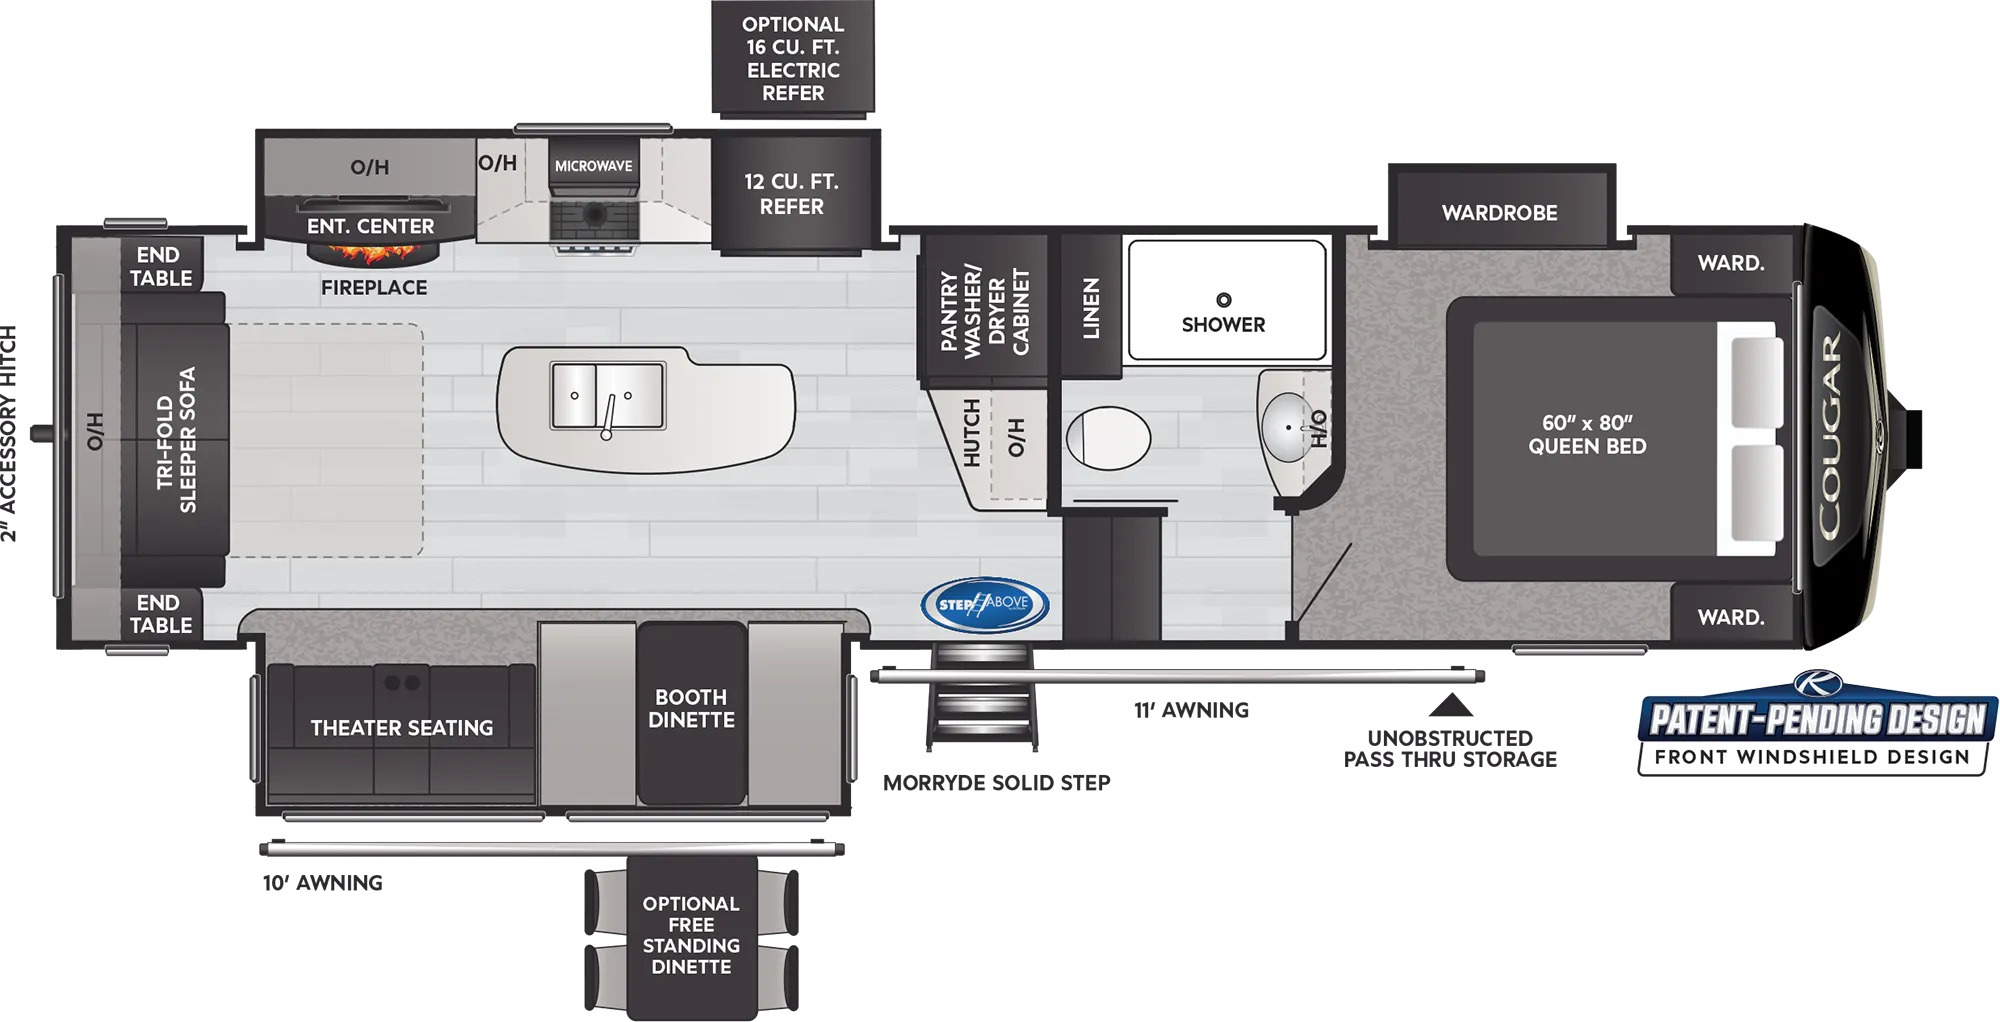 View Floor Plan for 2022 KEYSTONE COUGAR 290RLS